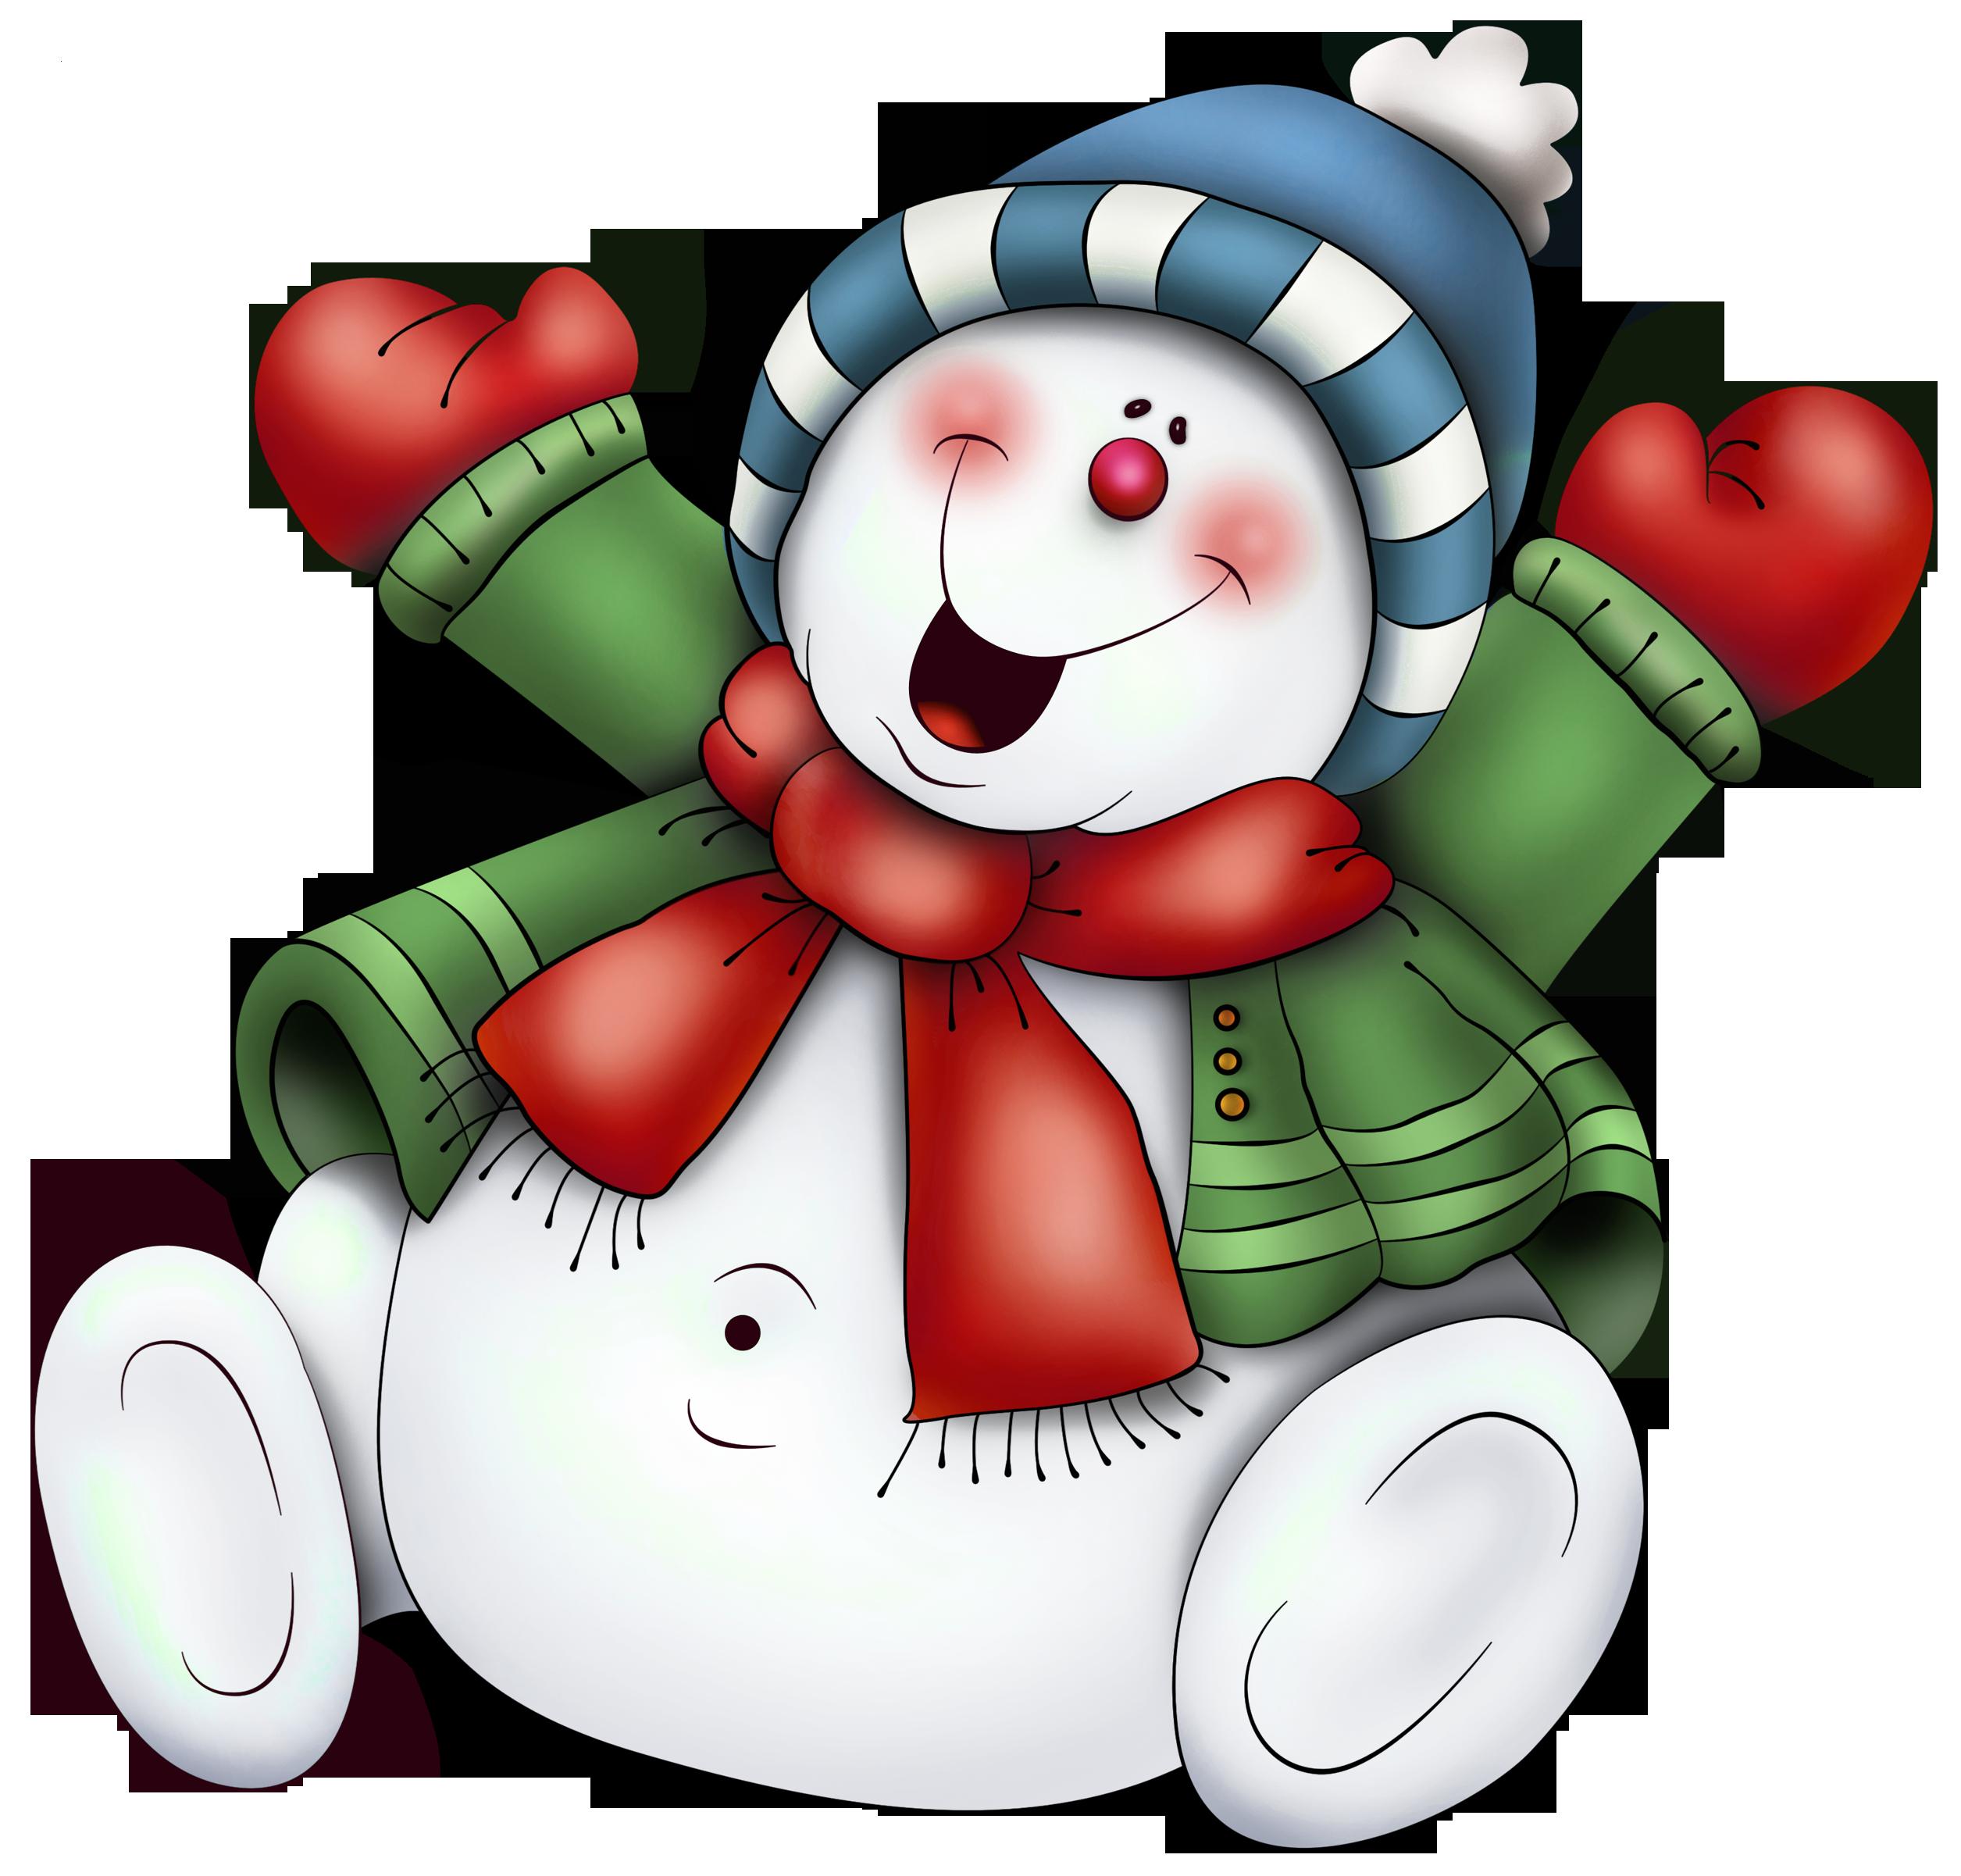 Santa Claus Candy cane Christmas Snowman Clip art.